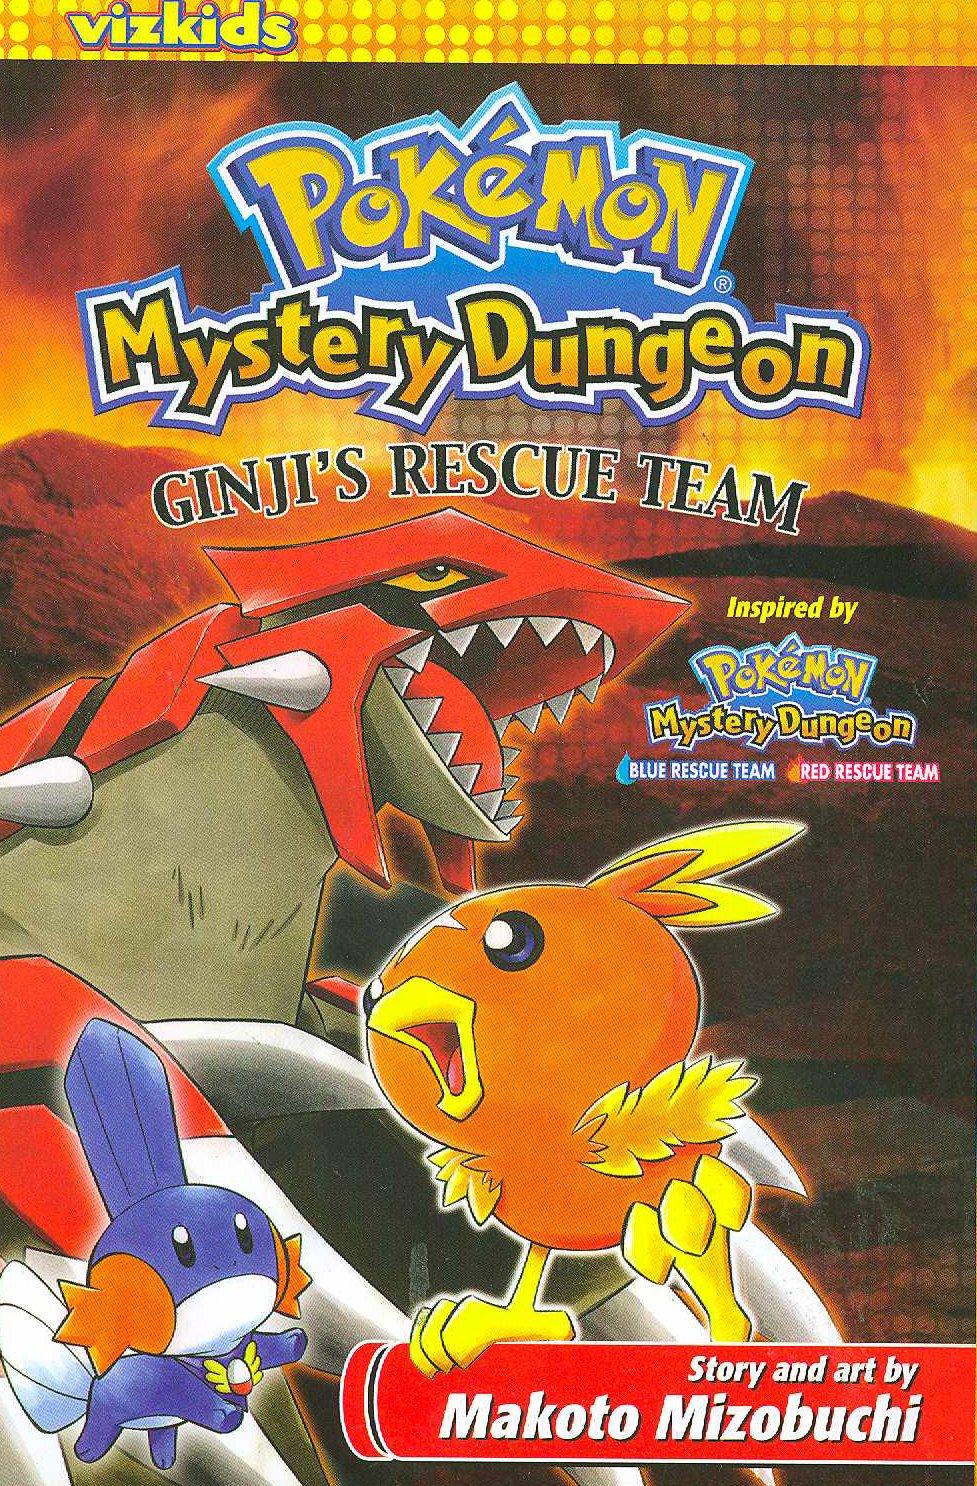 POKEMON MYSTERY DUNGEON GINJIS RESCUE TEAM GN (C: 1-0-0)